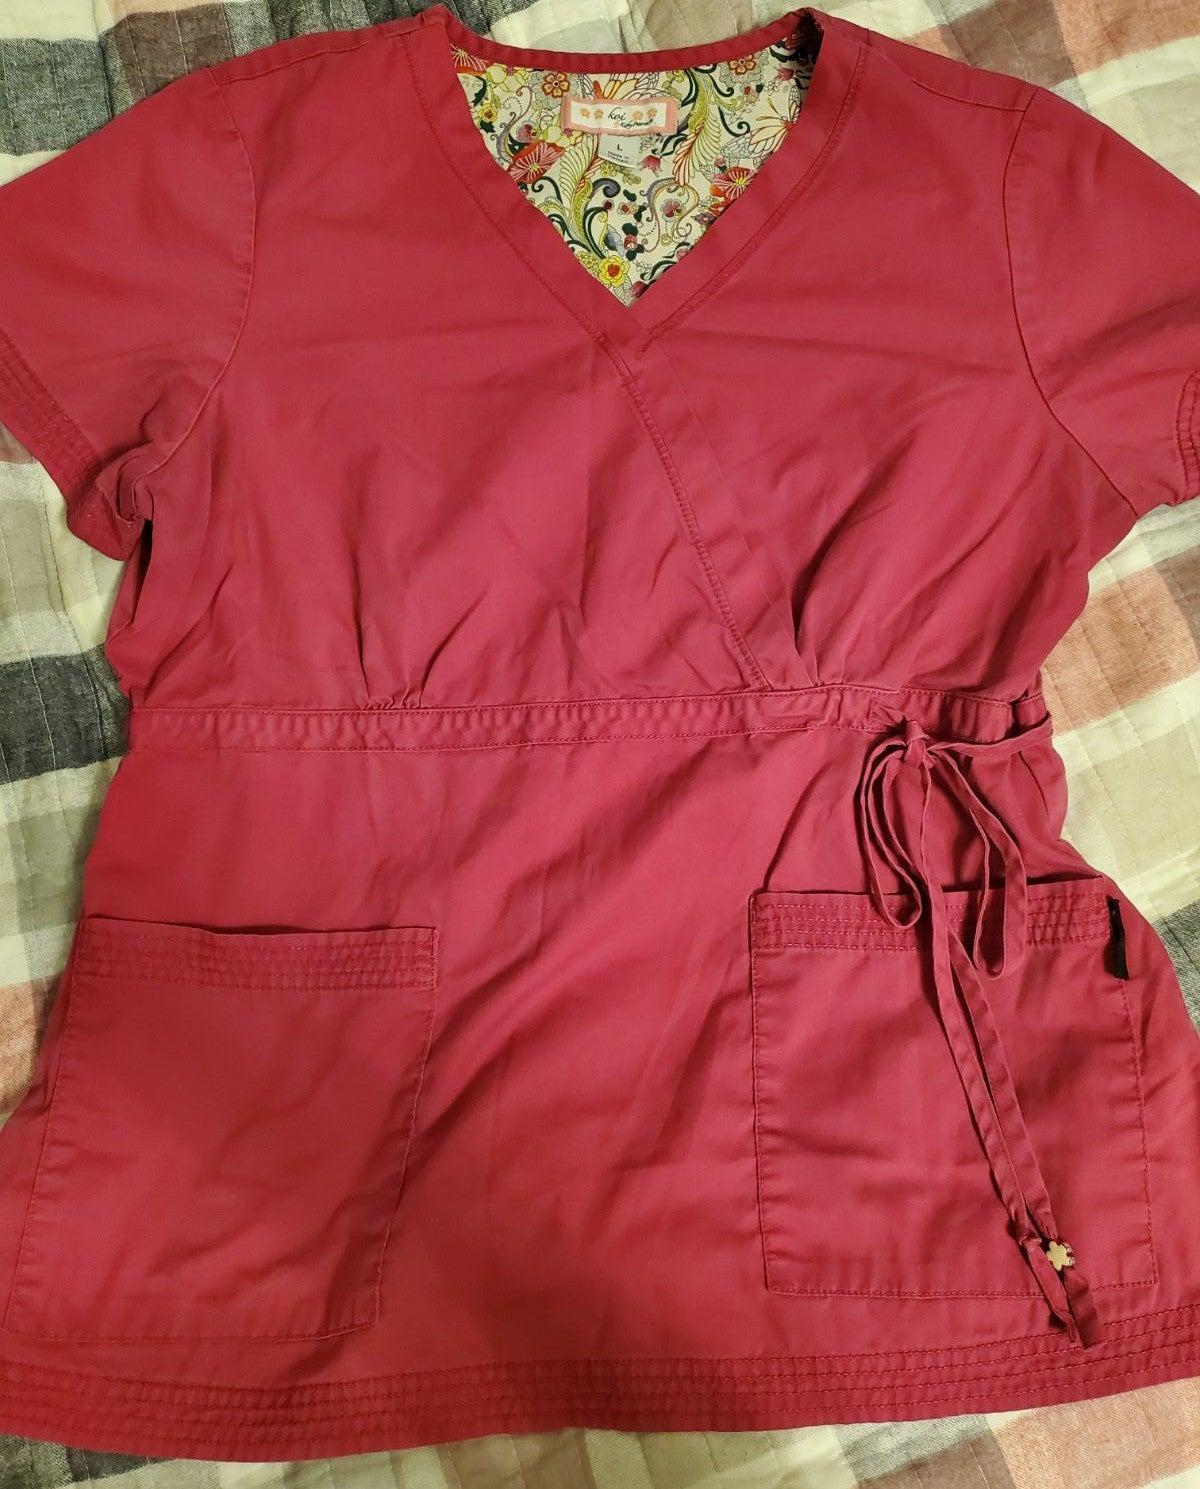 Koi pink scrub top